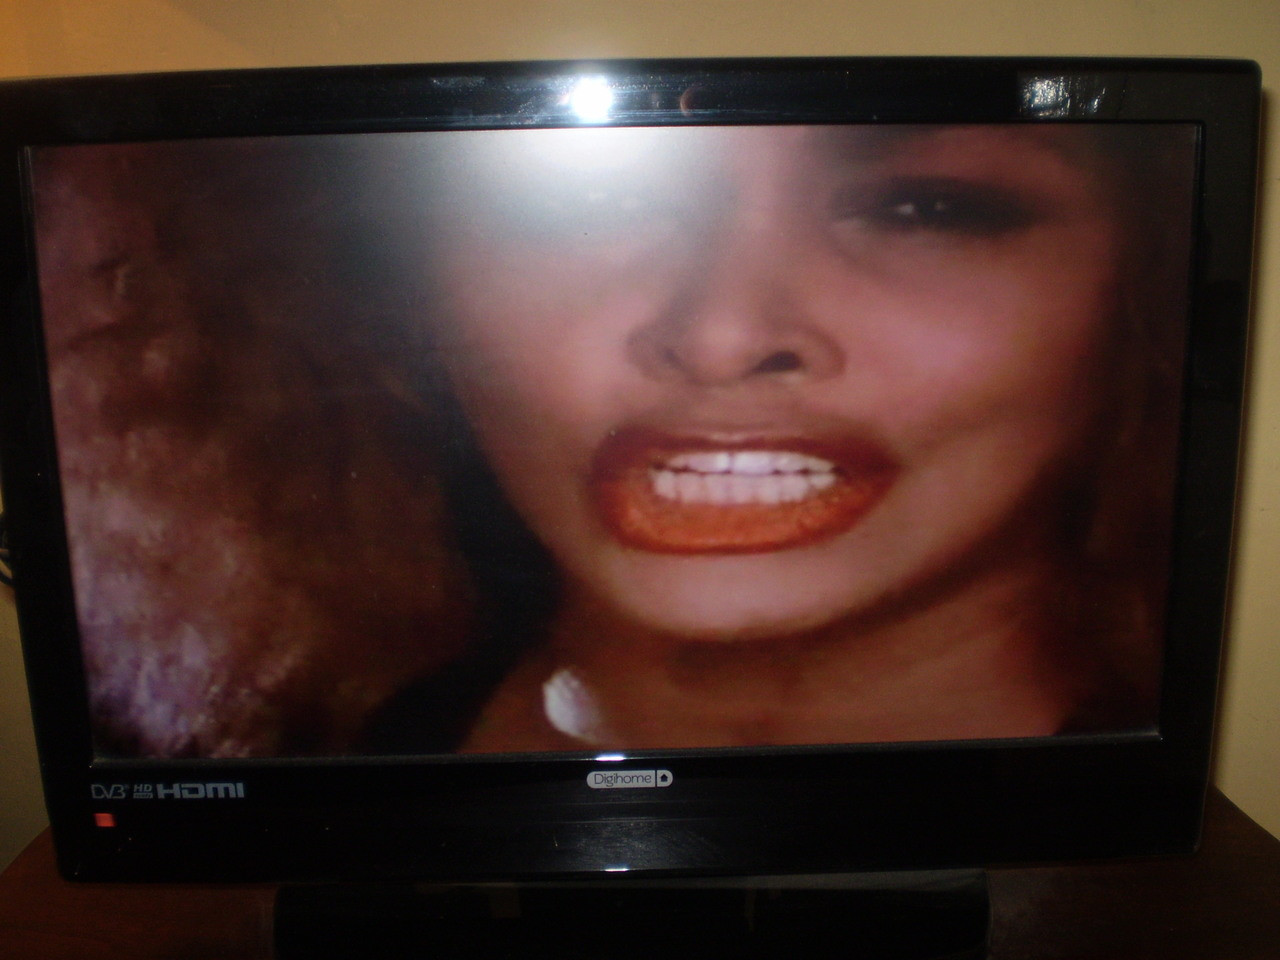 The Very Best of Tina Turner DVD,1980's R & B,1980's Soul 1980's Pop